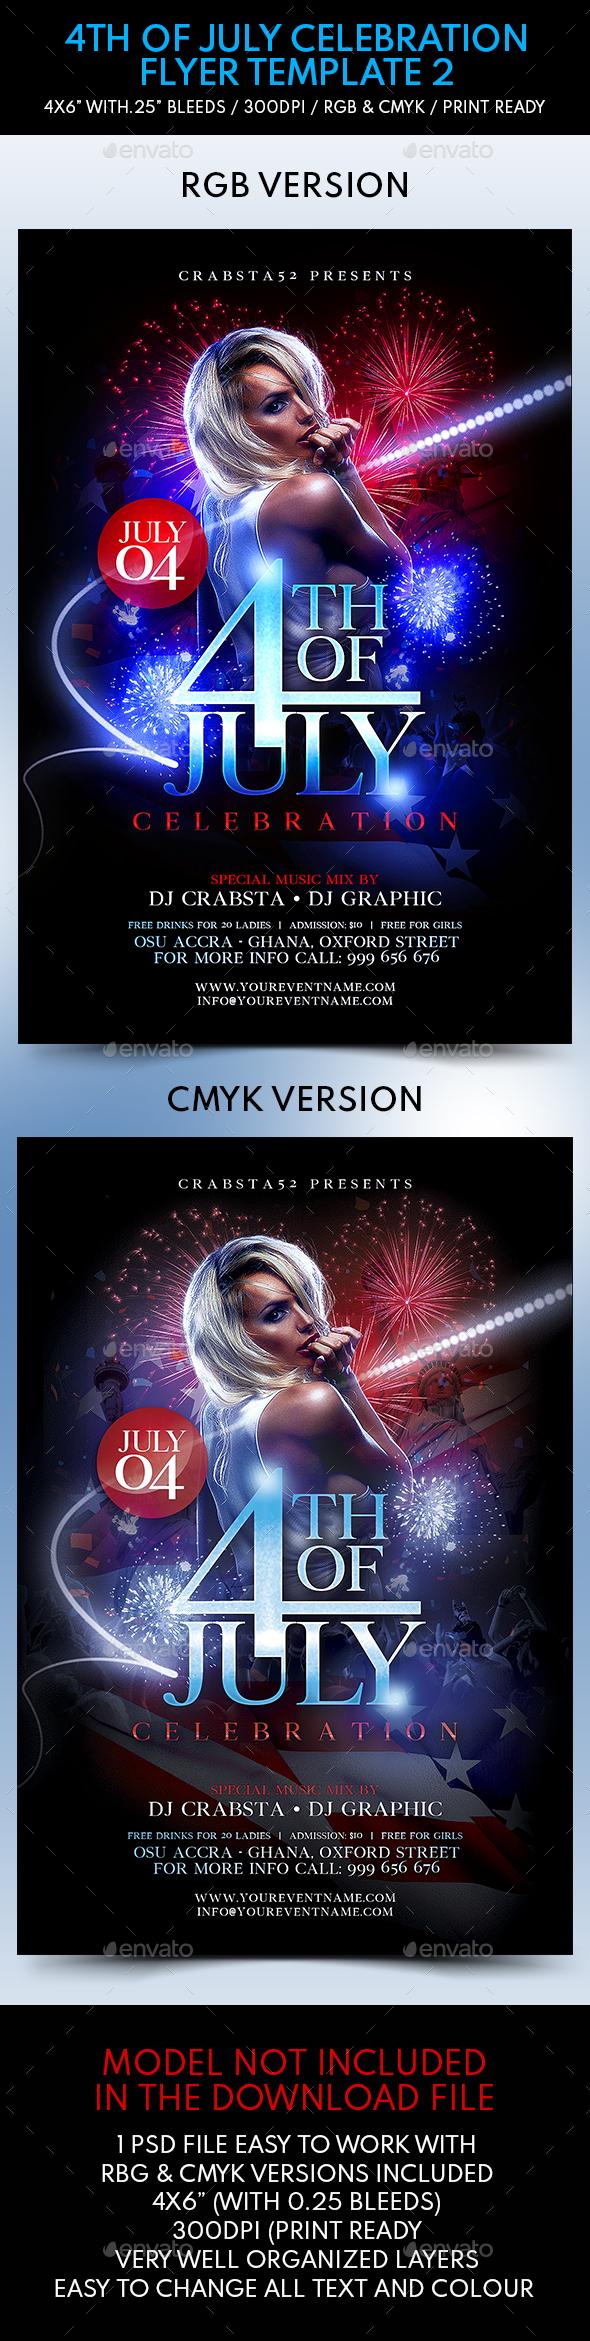 4th of July Celebration Flyer Template 2